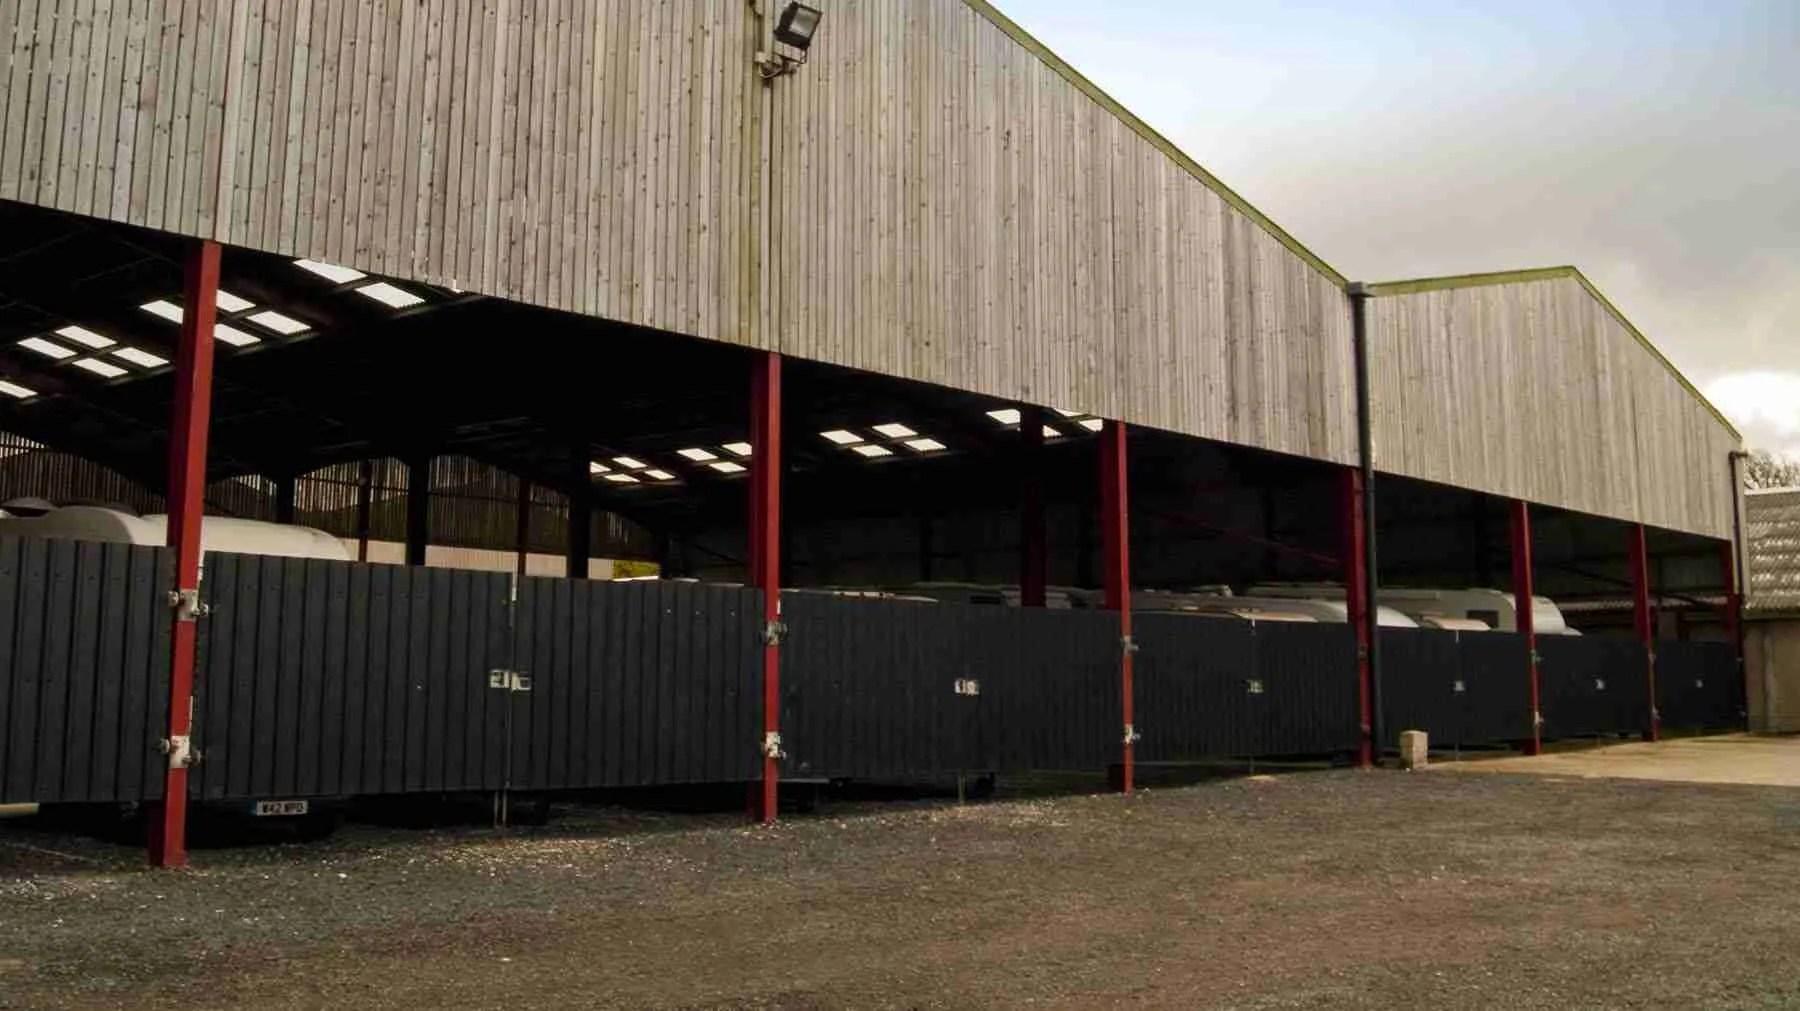 indoor caravan storage near blackpool